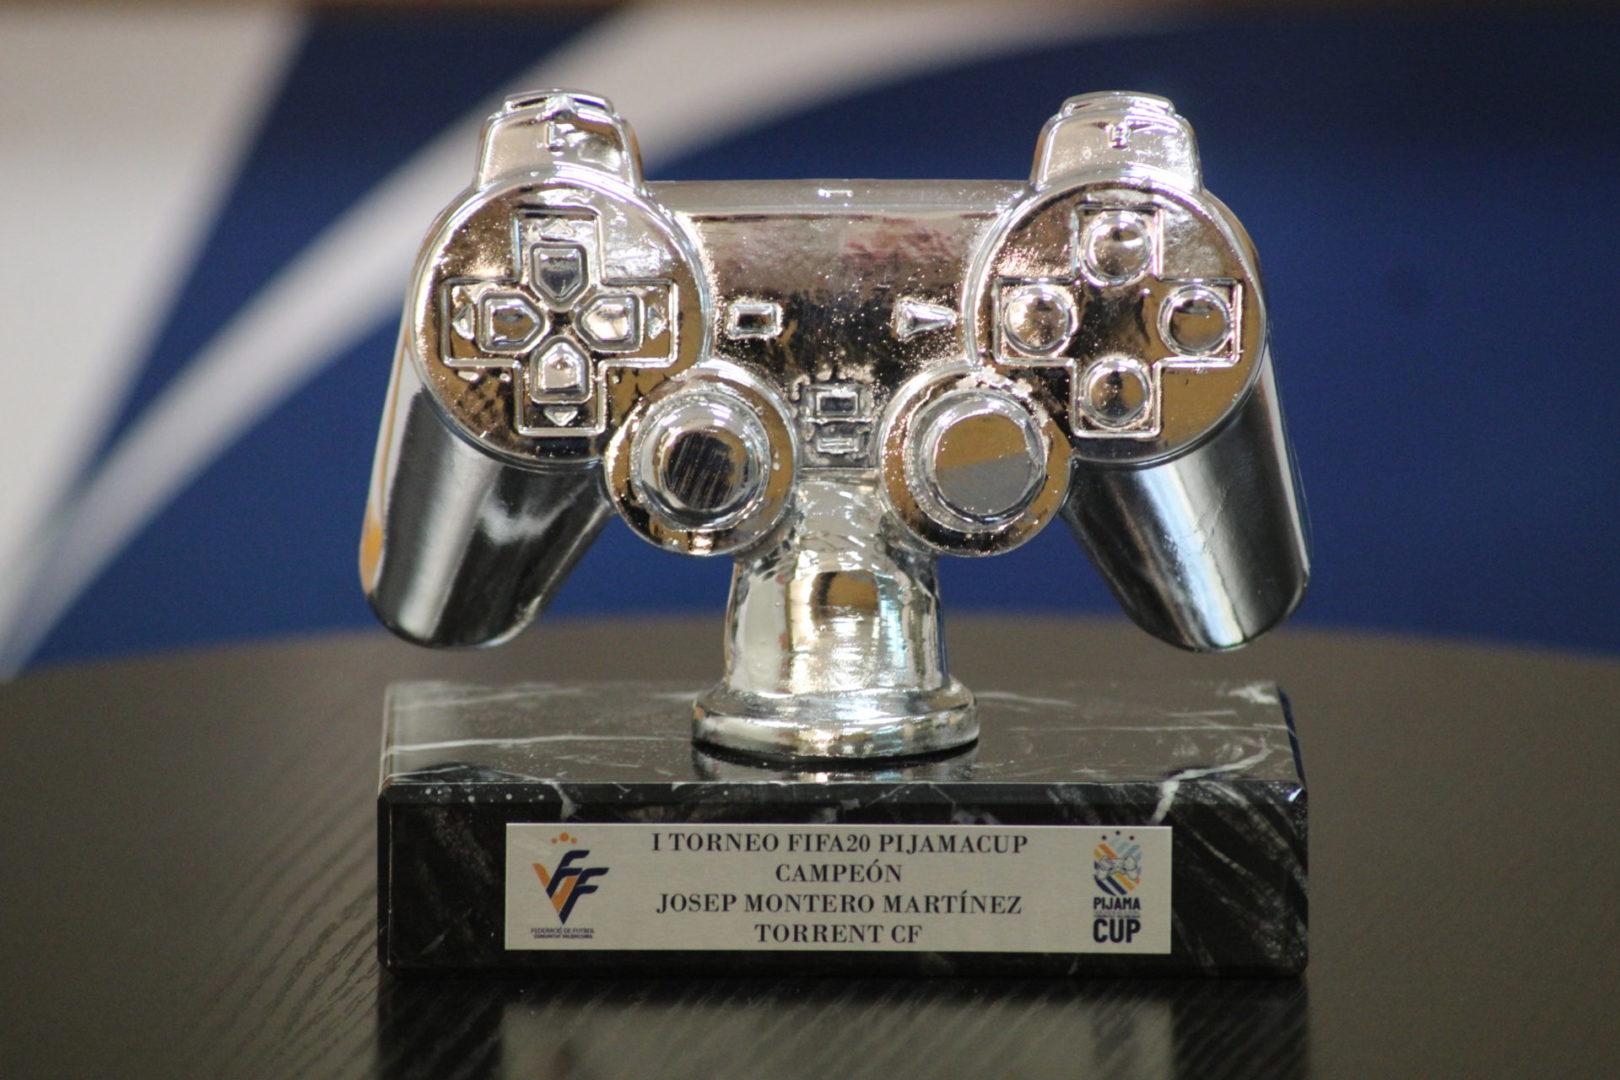 24 sep- Premios eSports PijamaCup GlobalEstiuCup